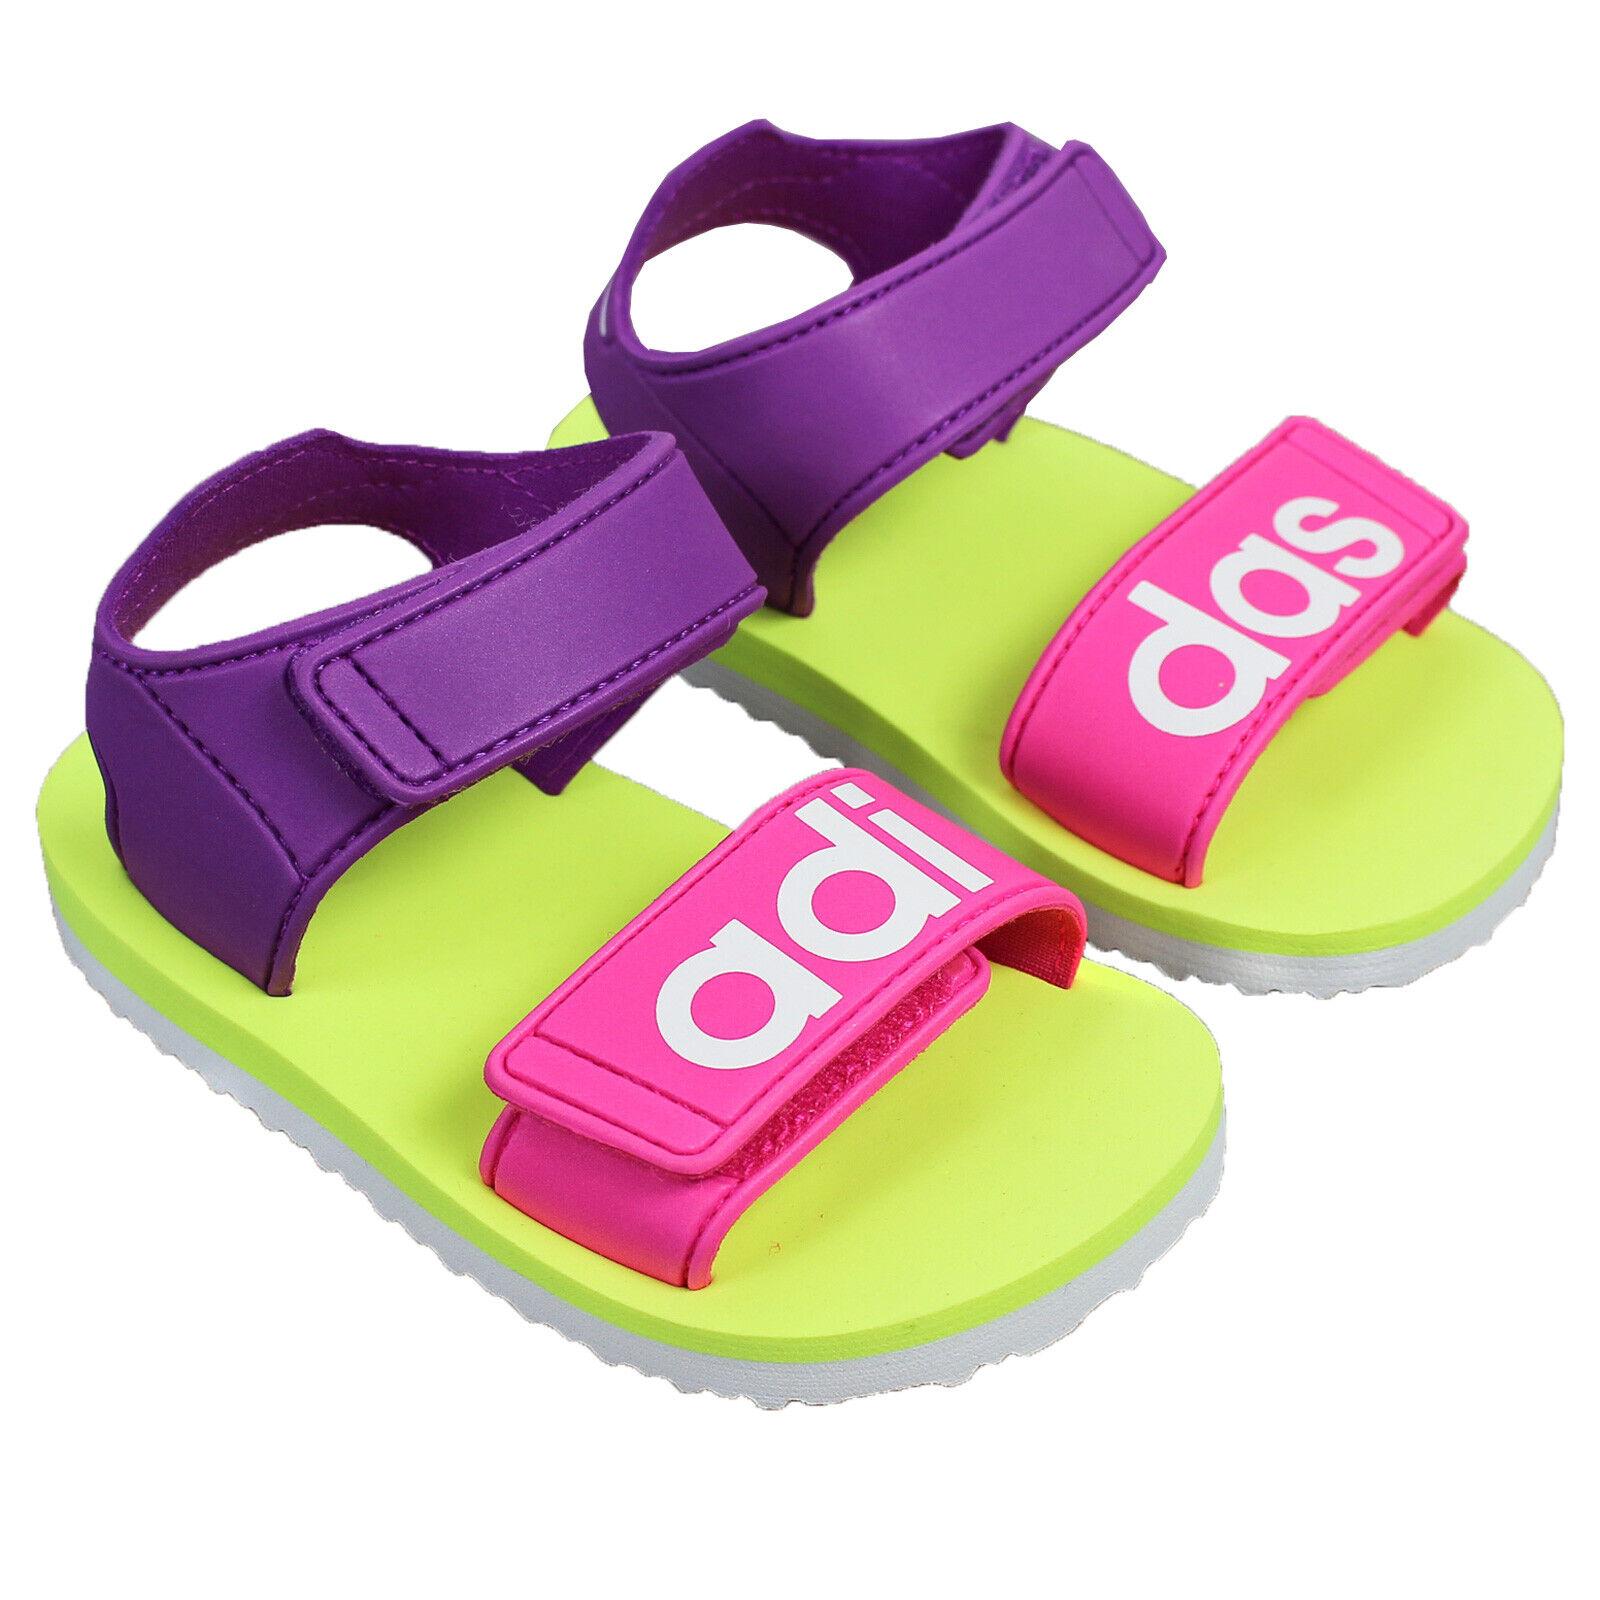 adidas Beach Sandale Kinder Badeschuhe Sommerschuhe Strand Schwimmbad Pink Lila